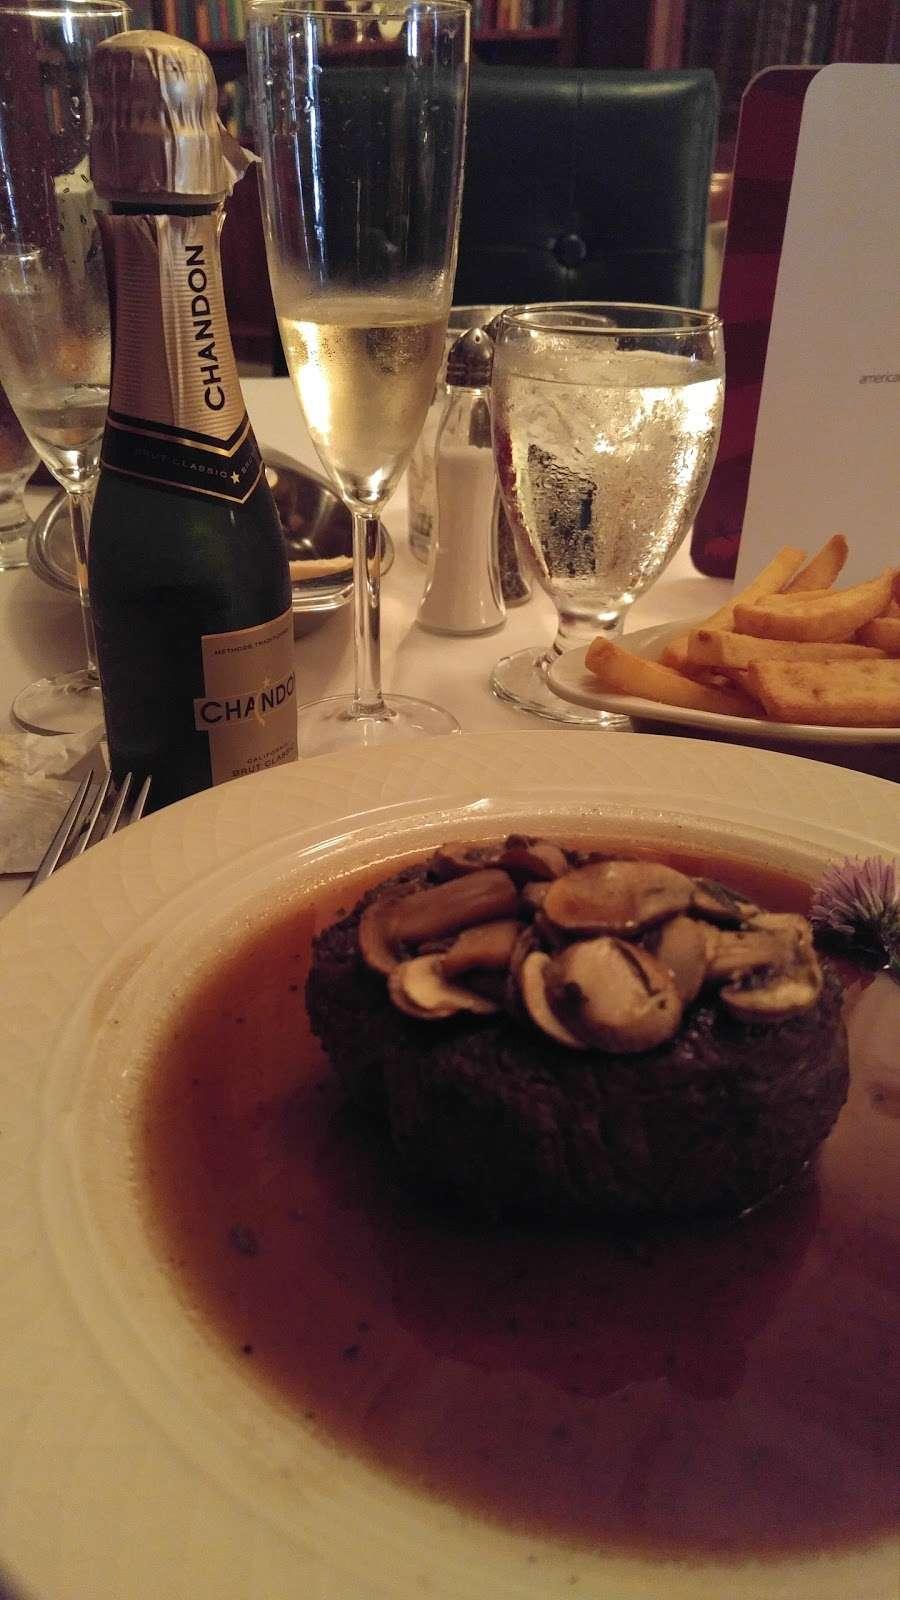 Old Colonial Inn - restaurant  | Photo 4 of 10 | Address: 216 N 3rd St, Kentland, IN 47951, USA | Phone: (219) 474-6774